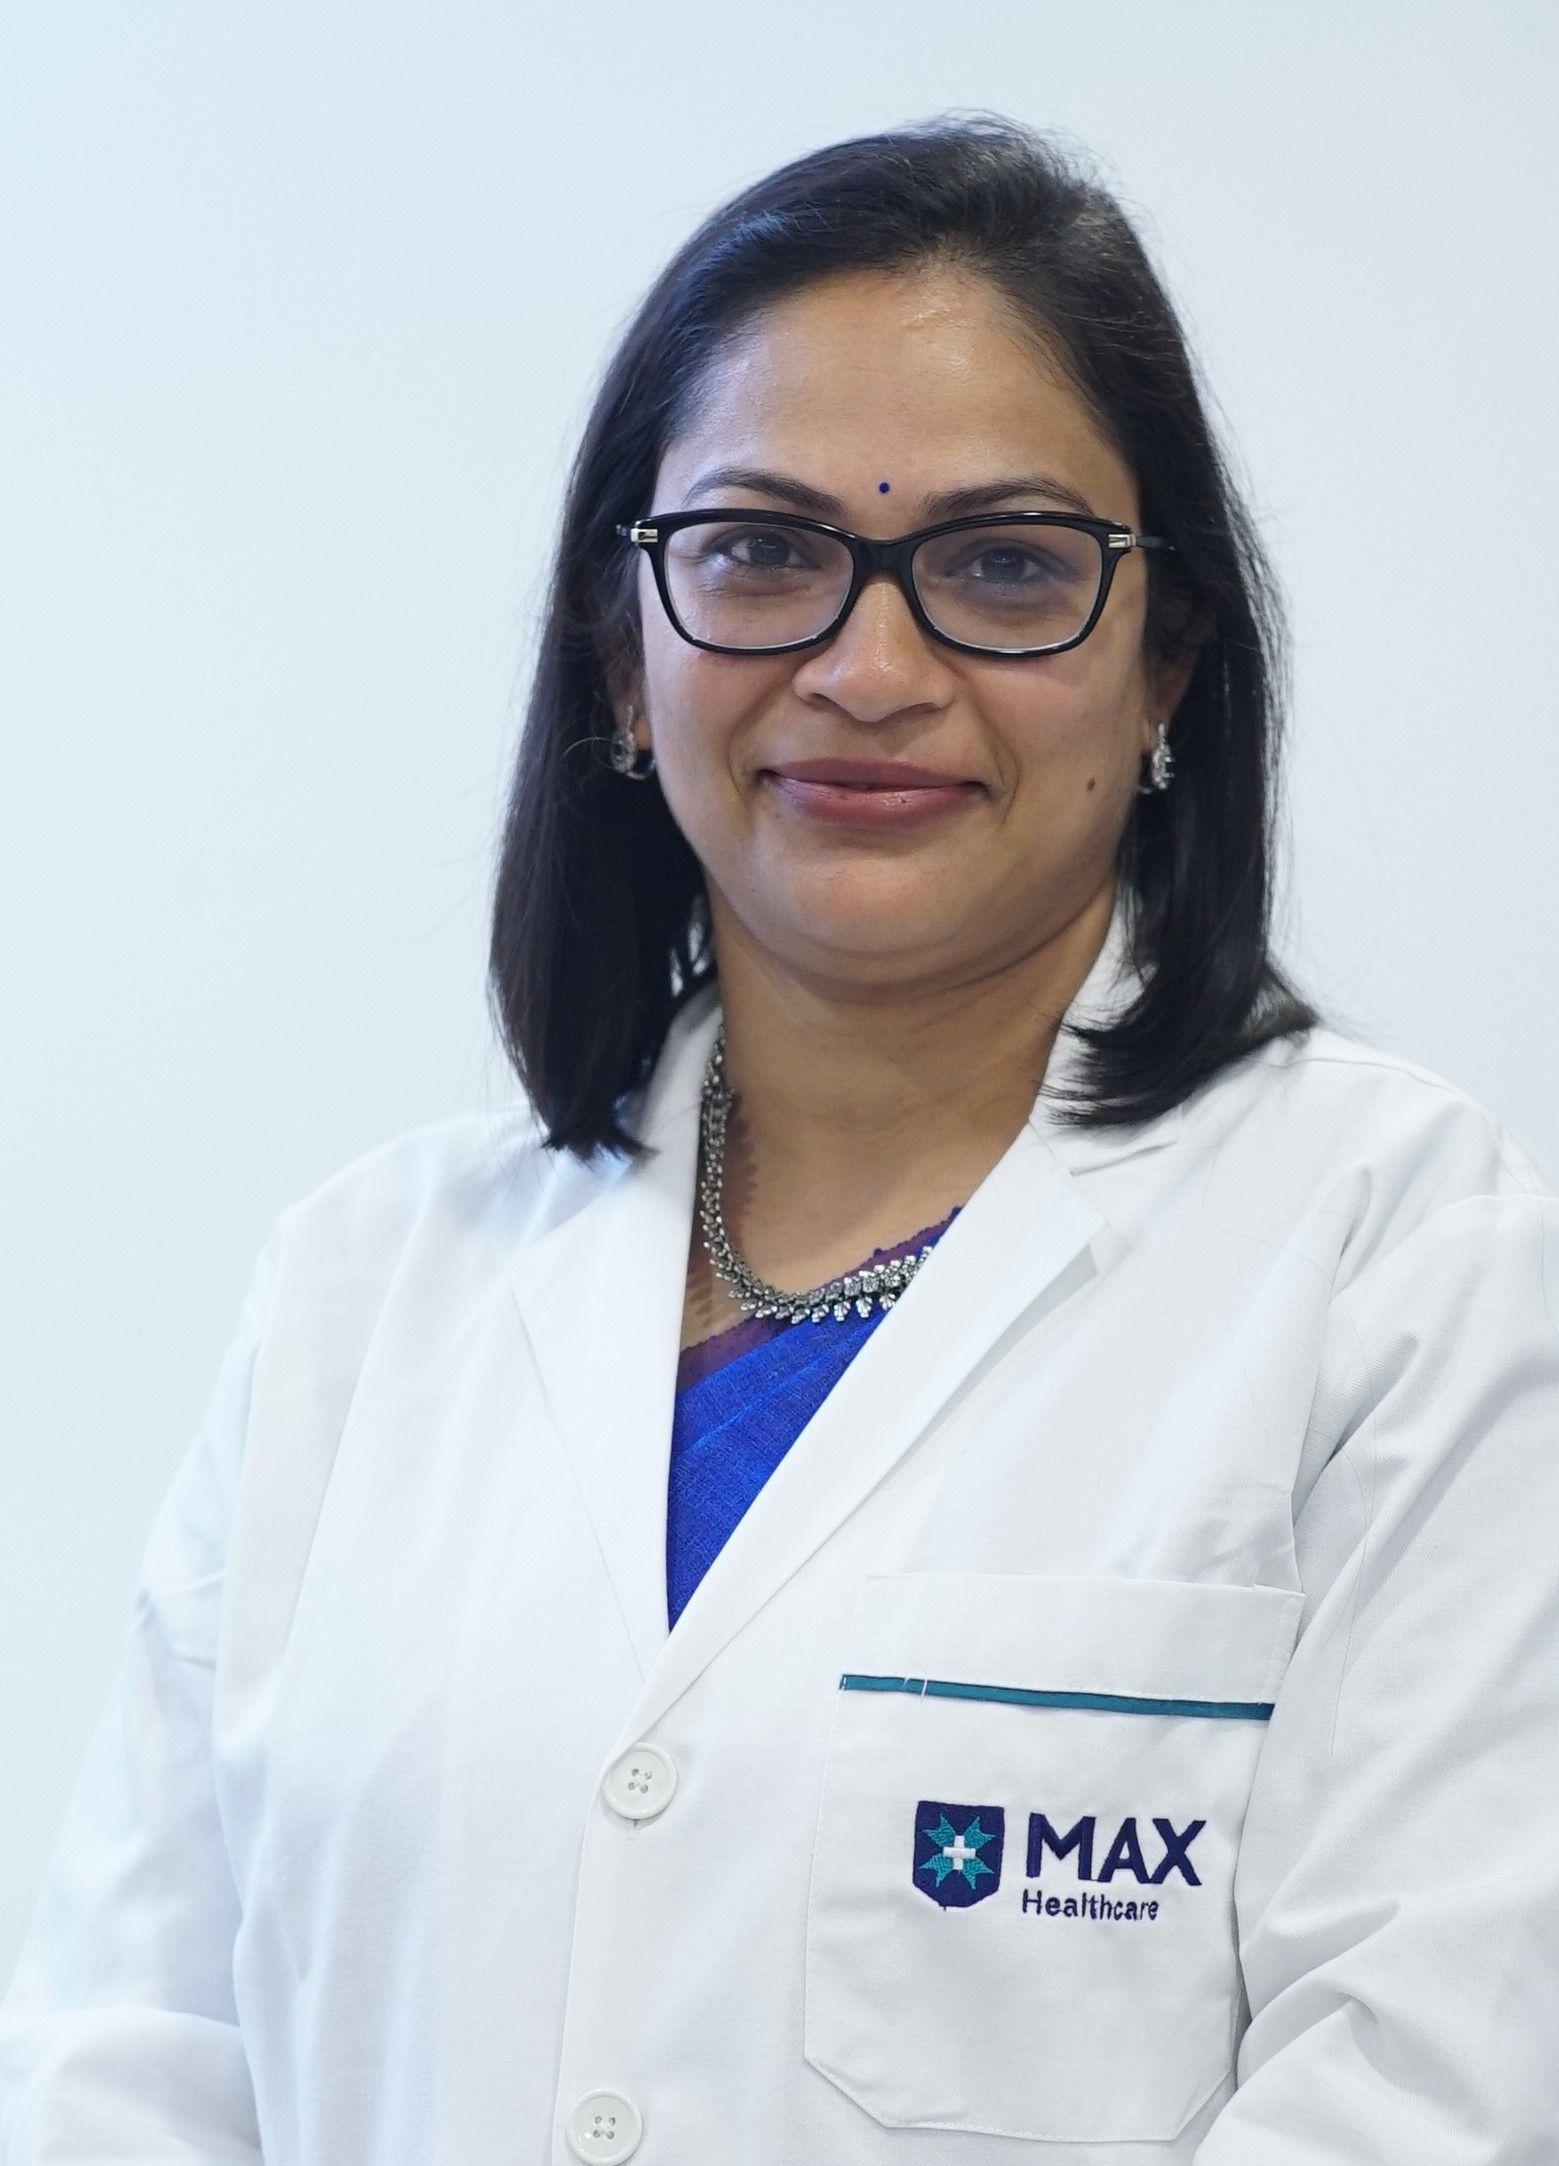 Dr. Aseemita Debata